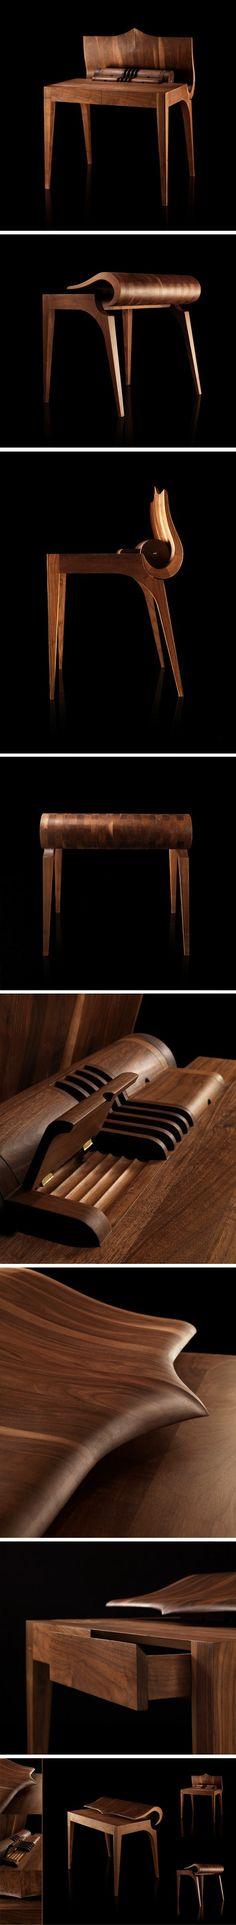 Art Nouveau inspired walnut desk